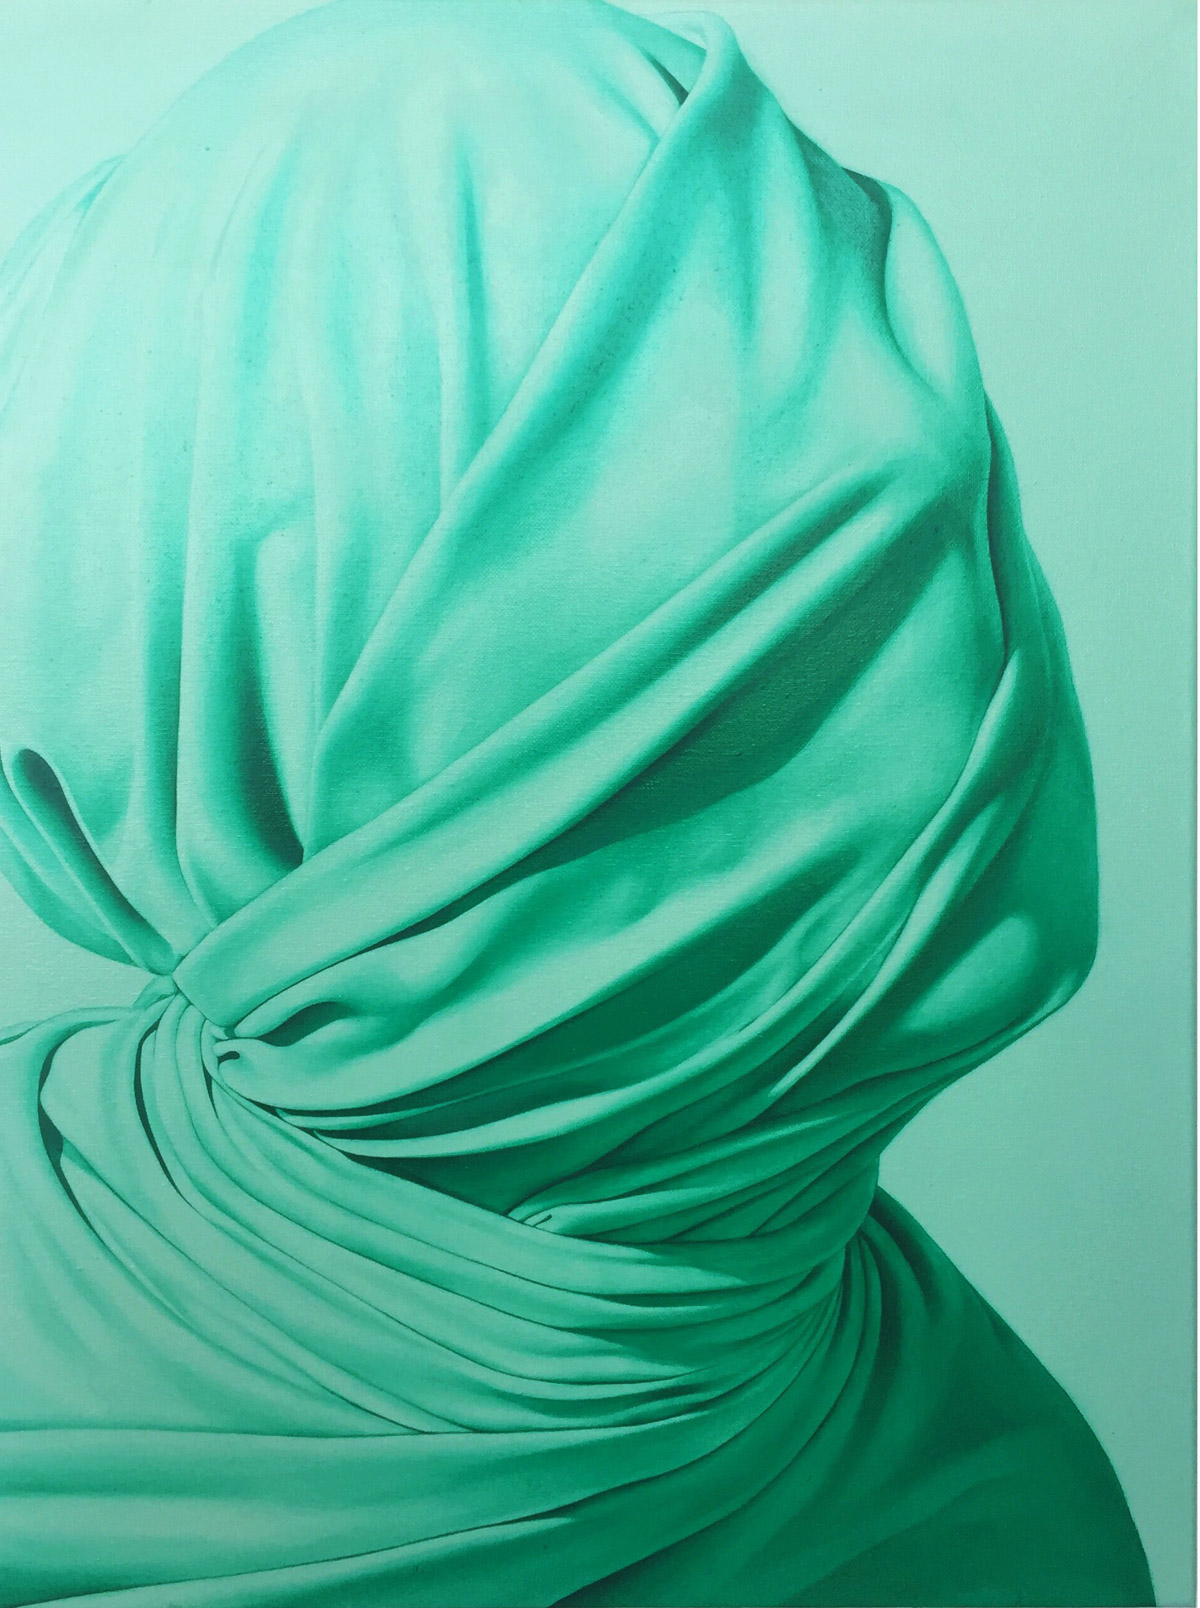 Alayna-Coverly-5.jpg